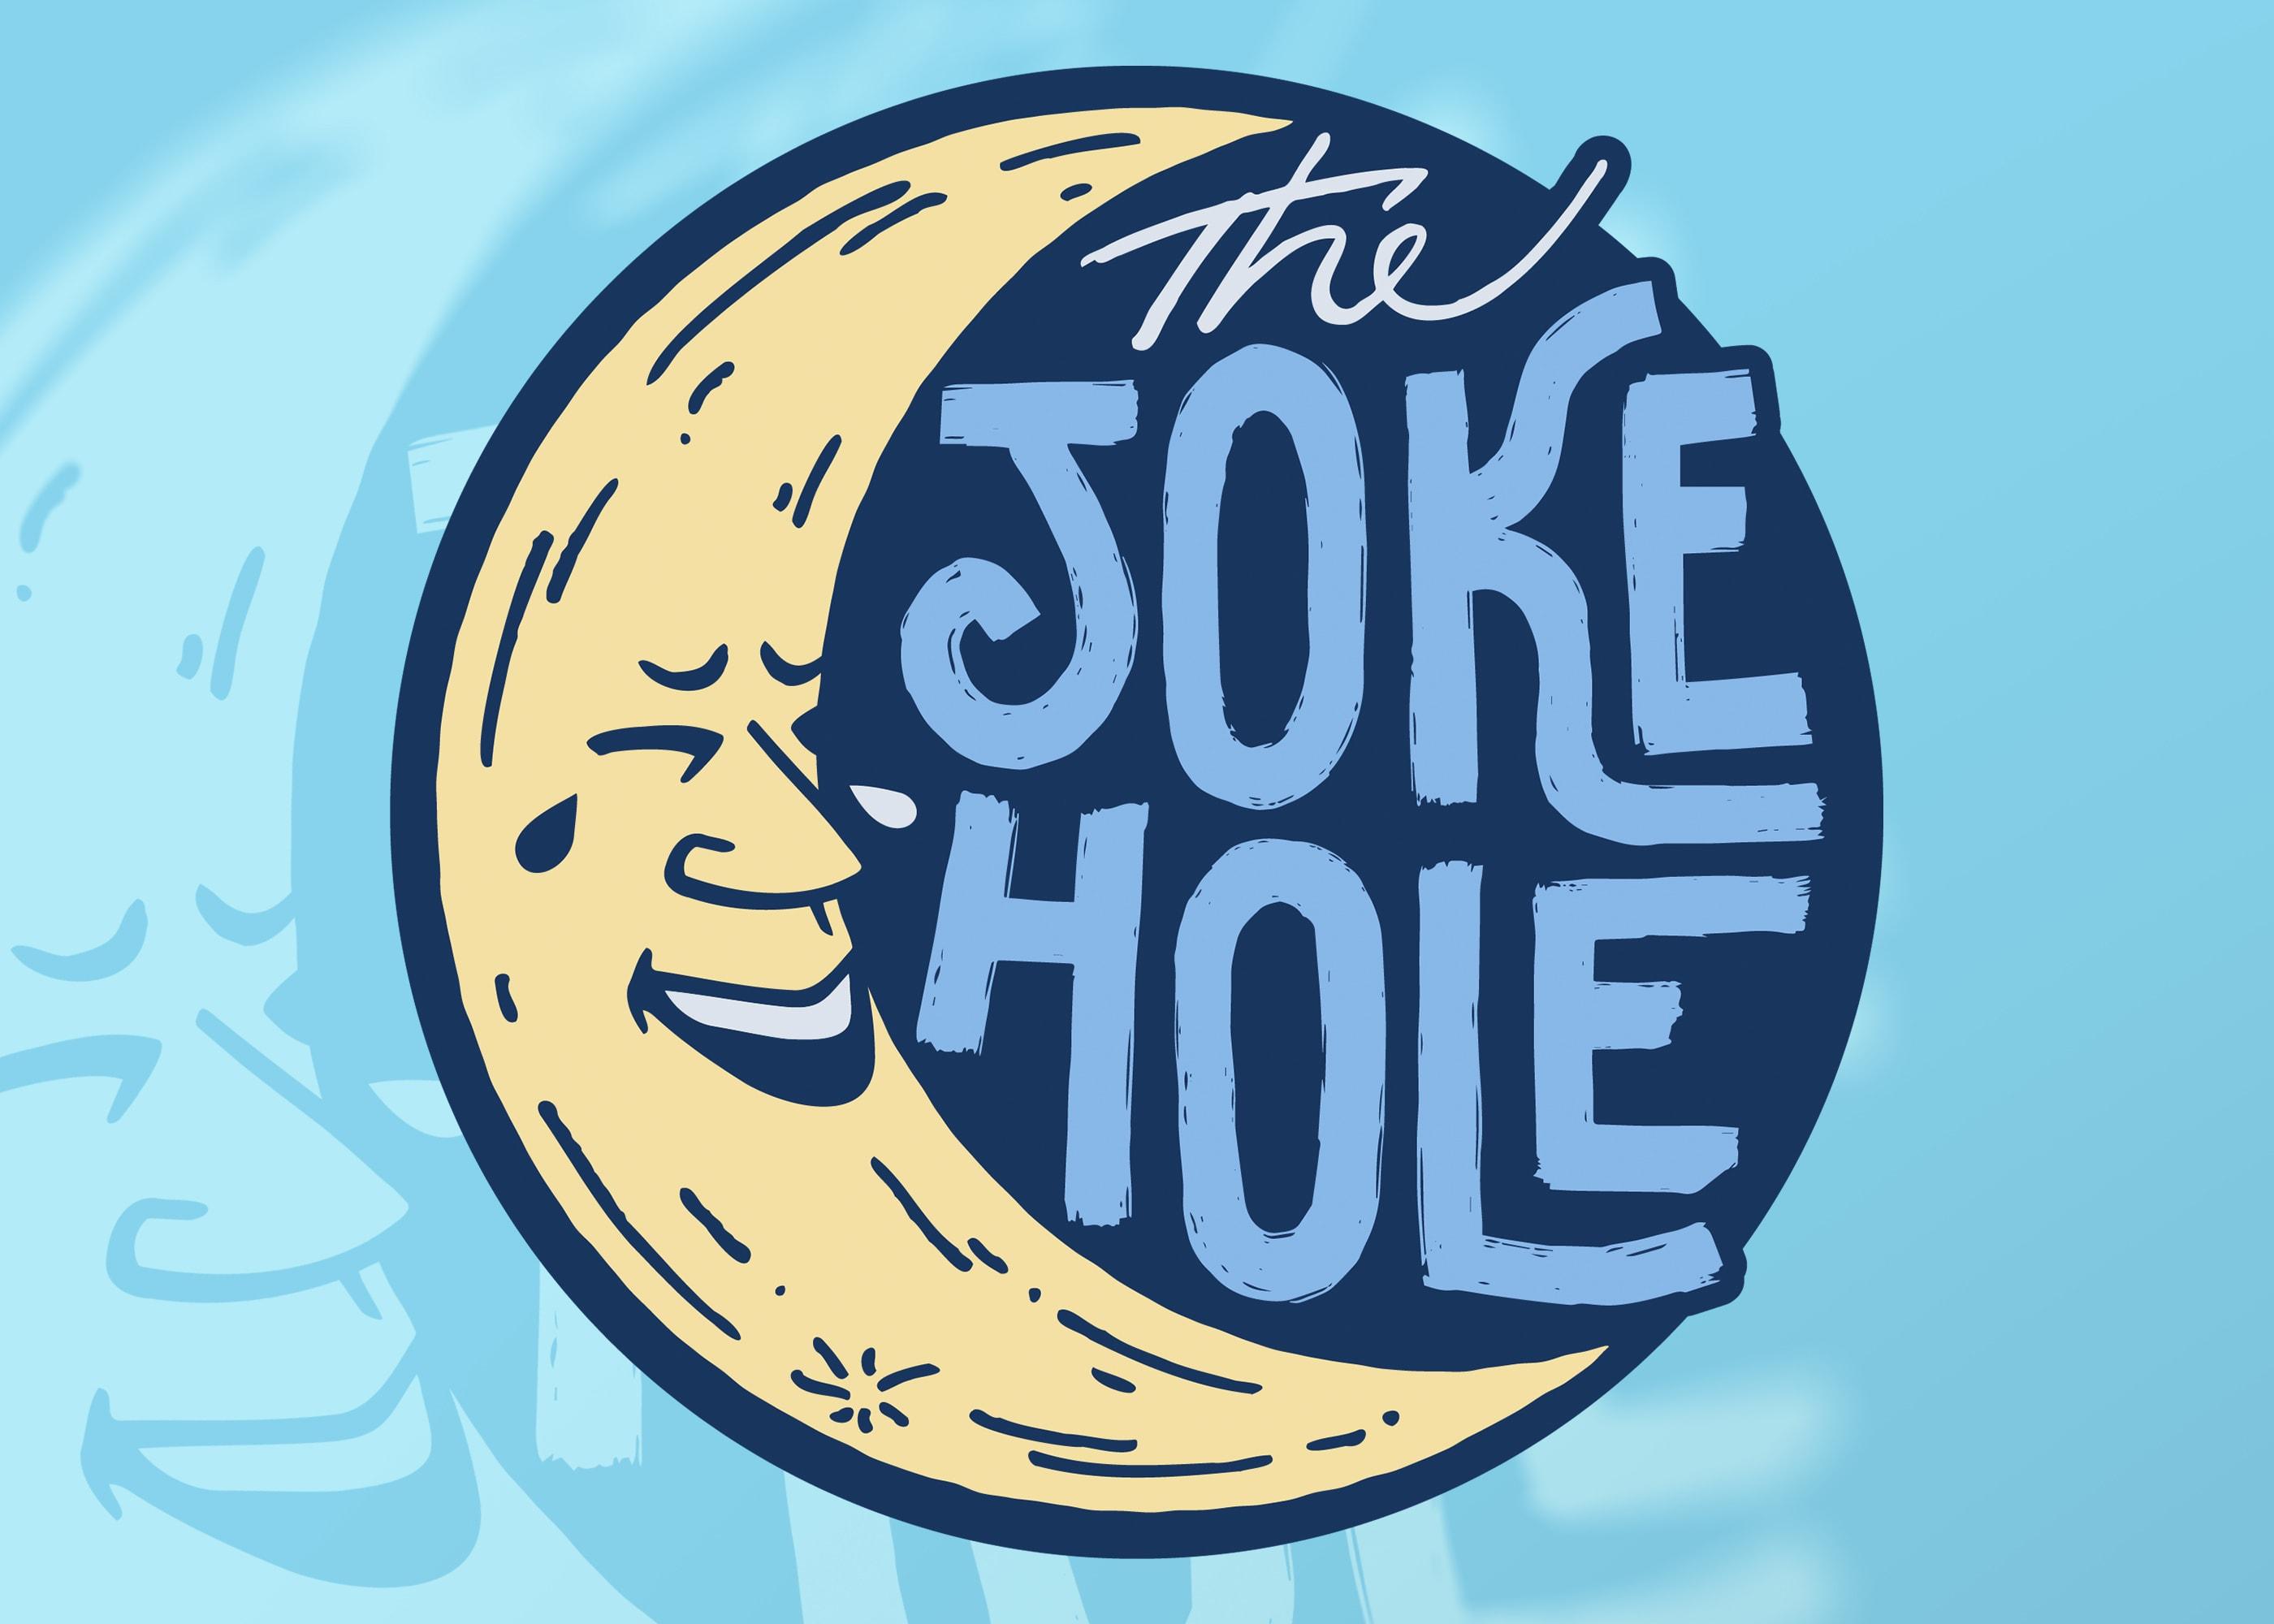 The Joke Hole